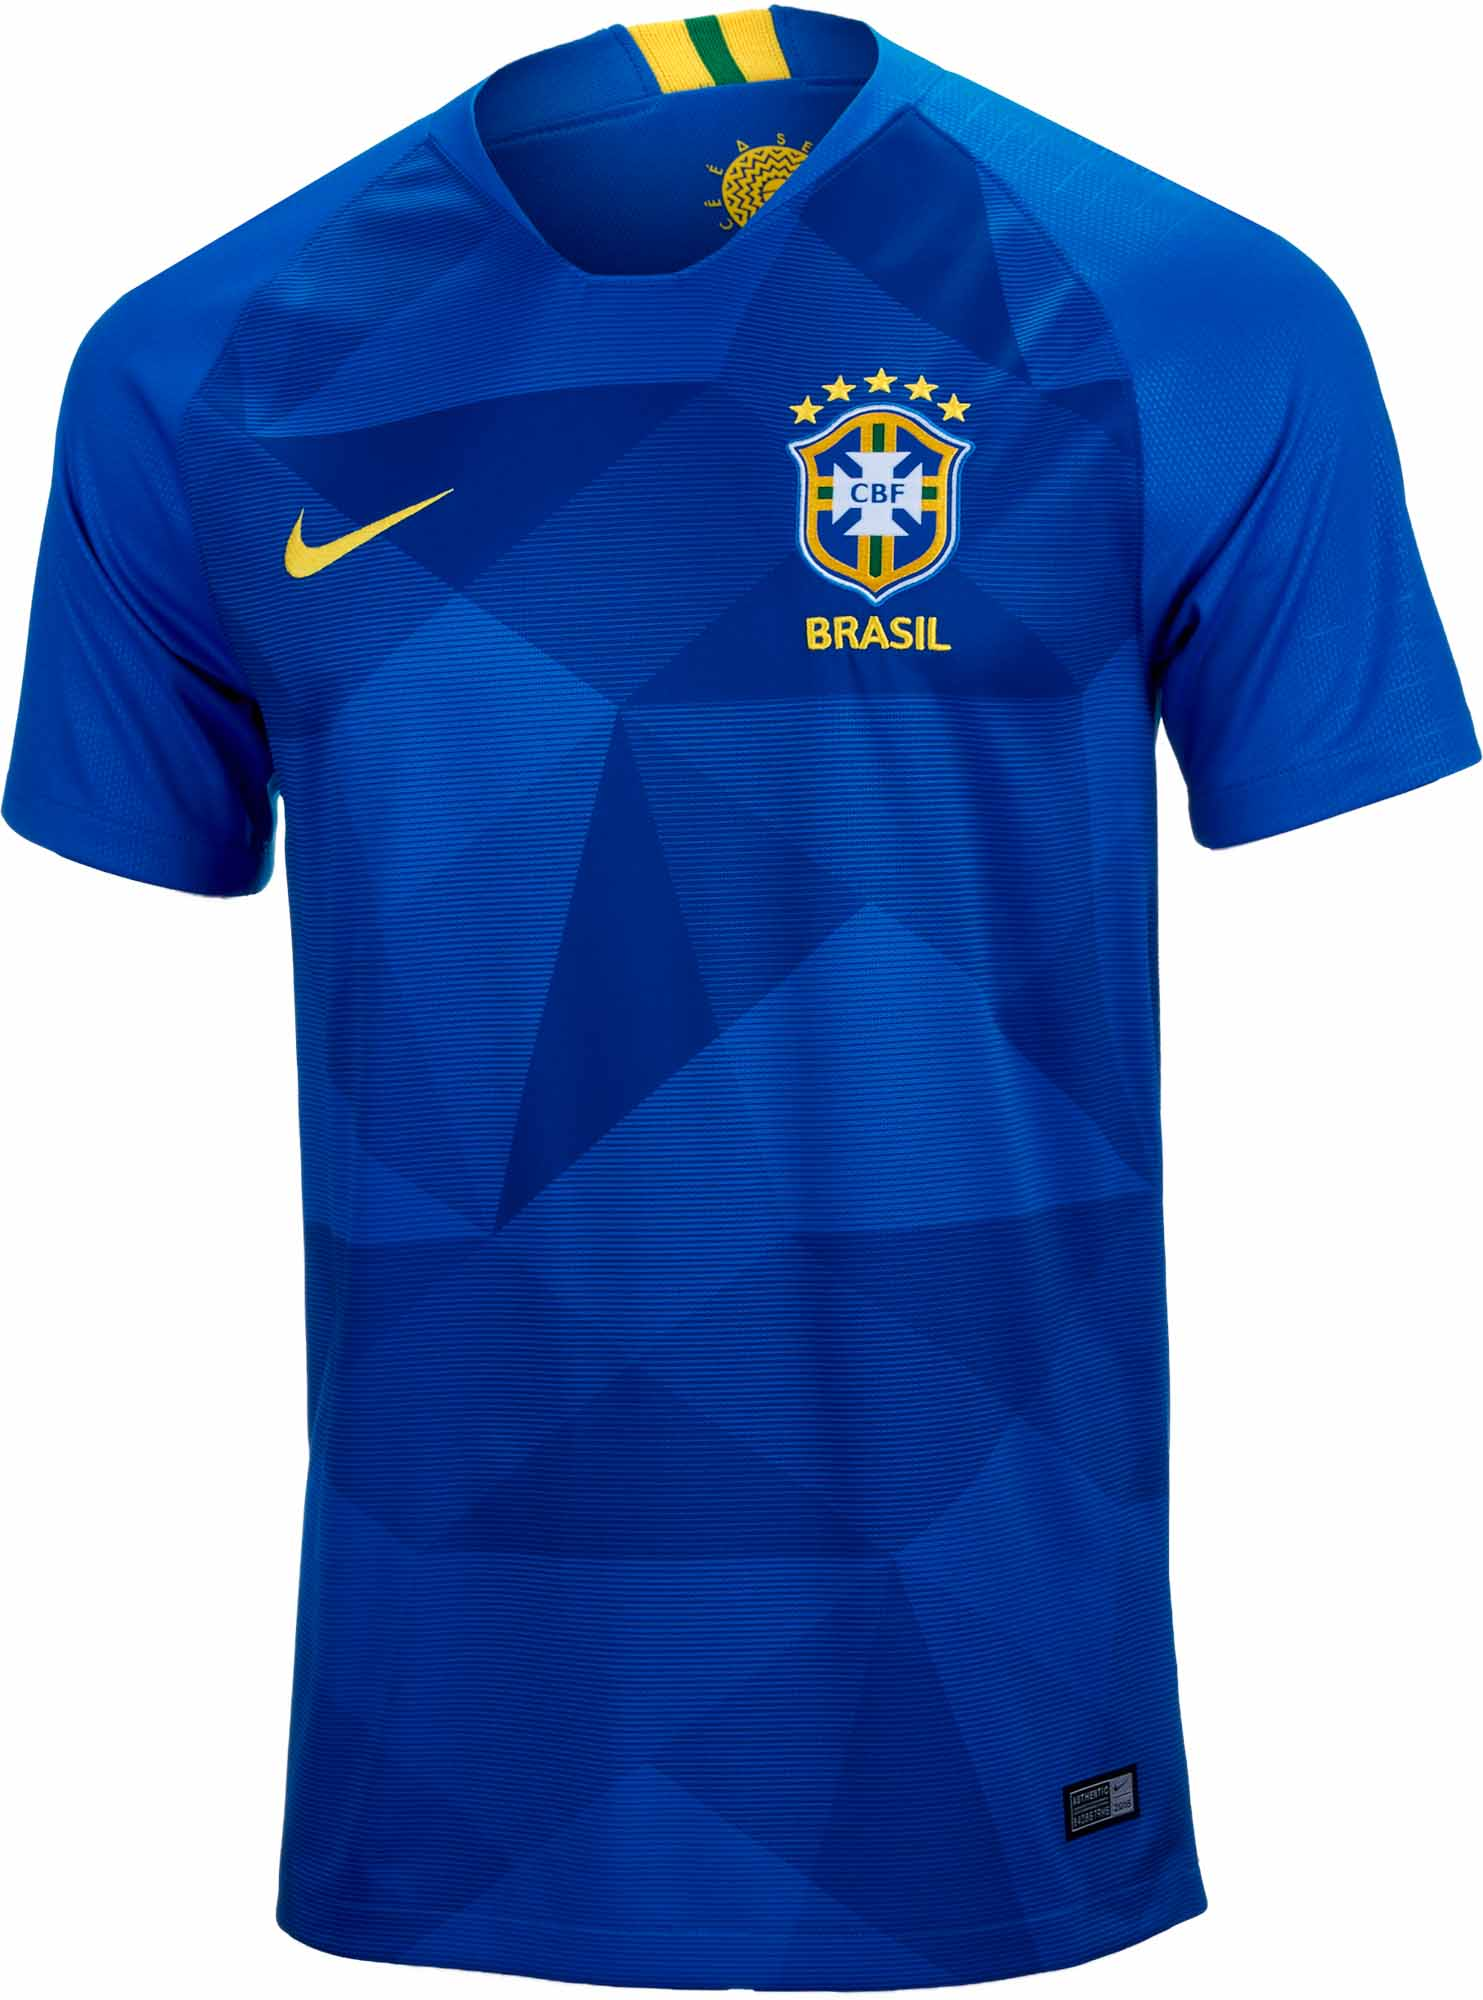 e1d223764 Nike Brazil Away Jersey - Youth 2018-19 NS - Soccer Master